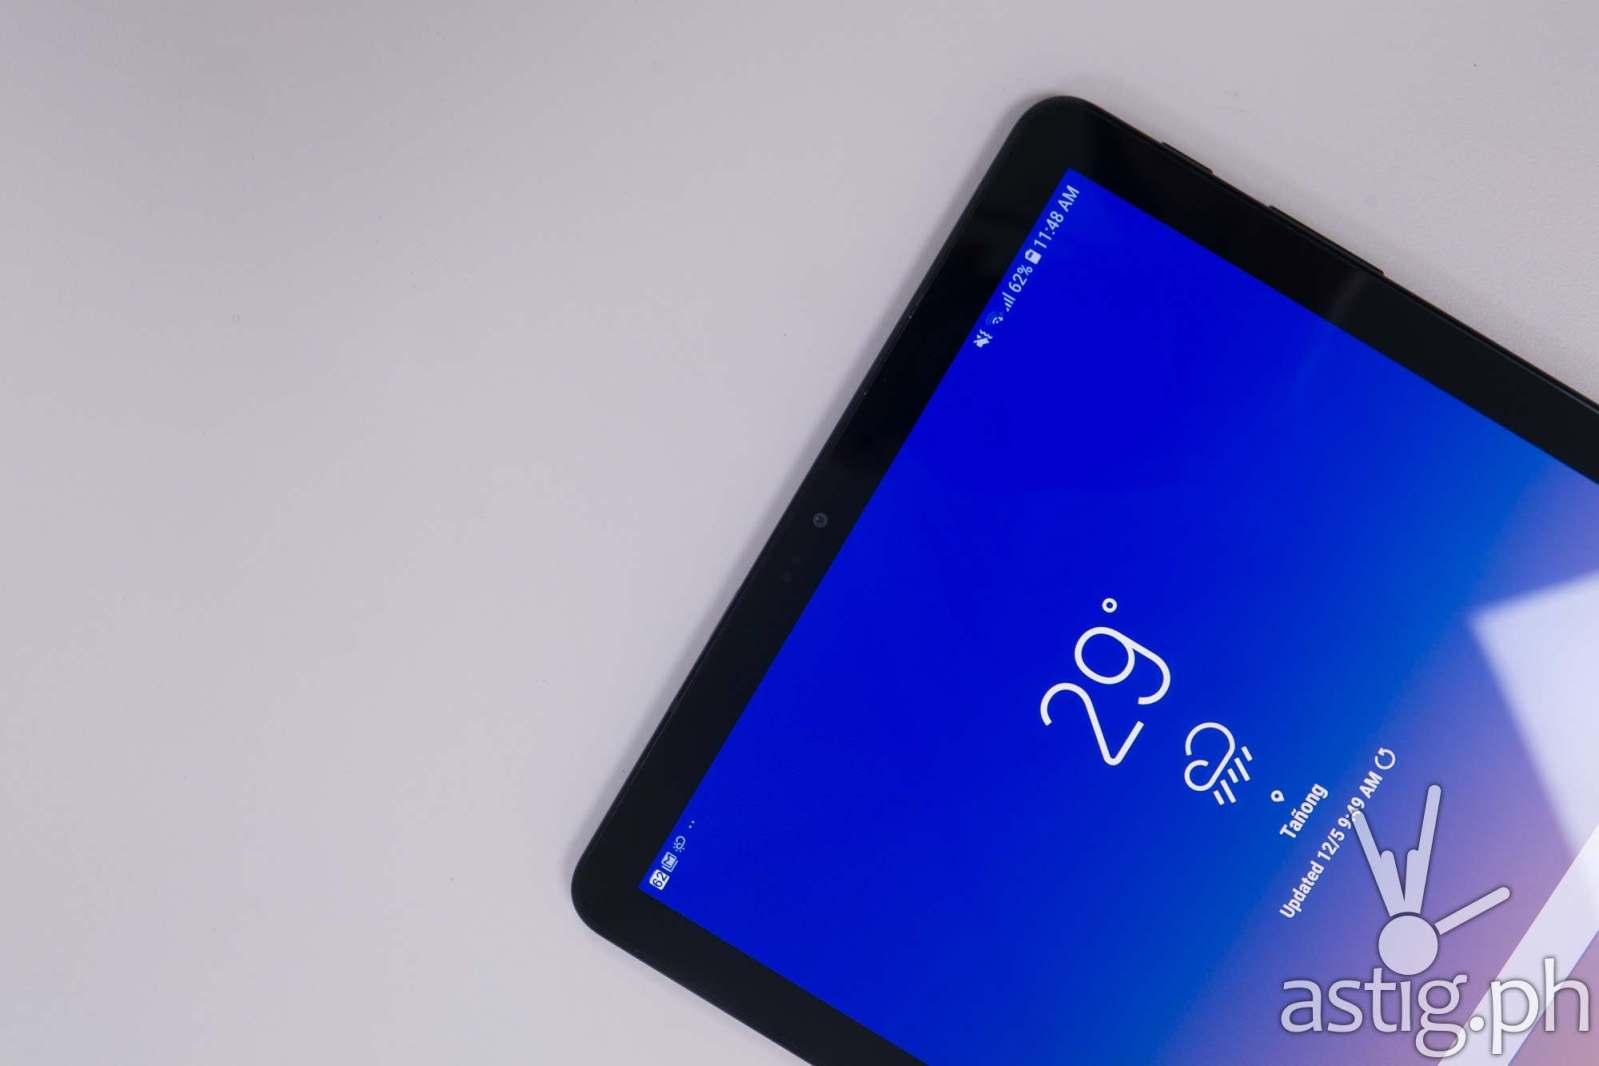 Top - Samsung Galaxy Tab S4 (Philippines)